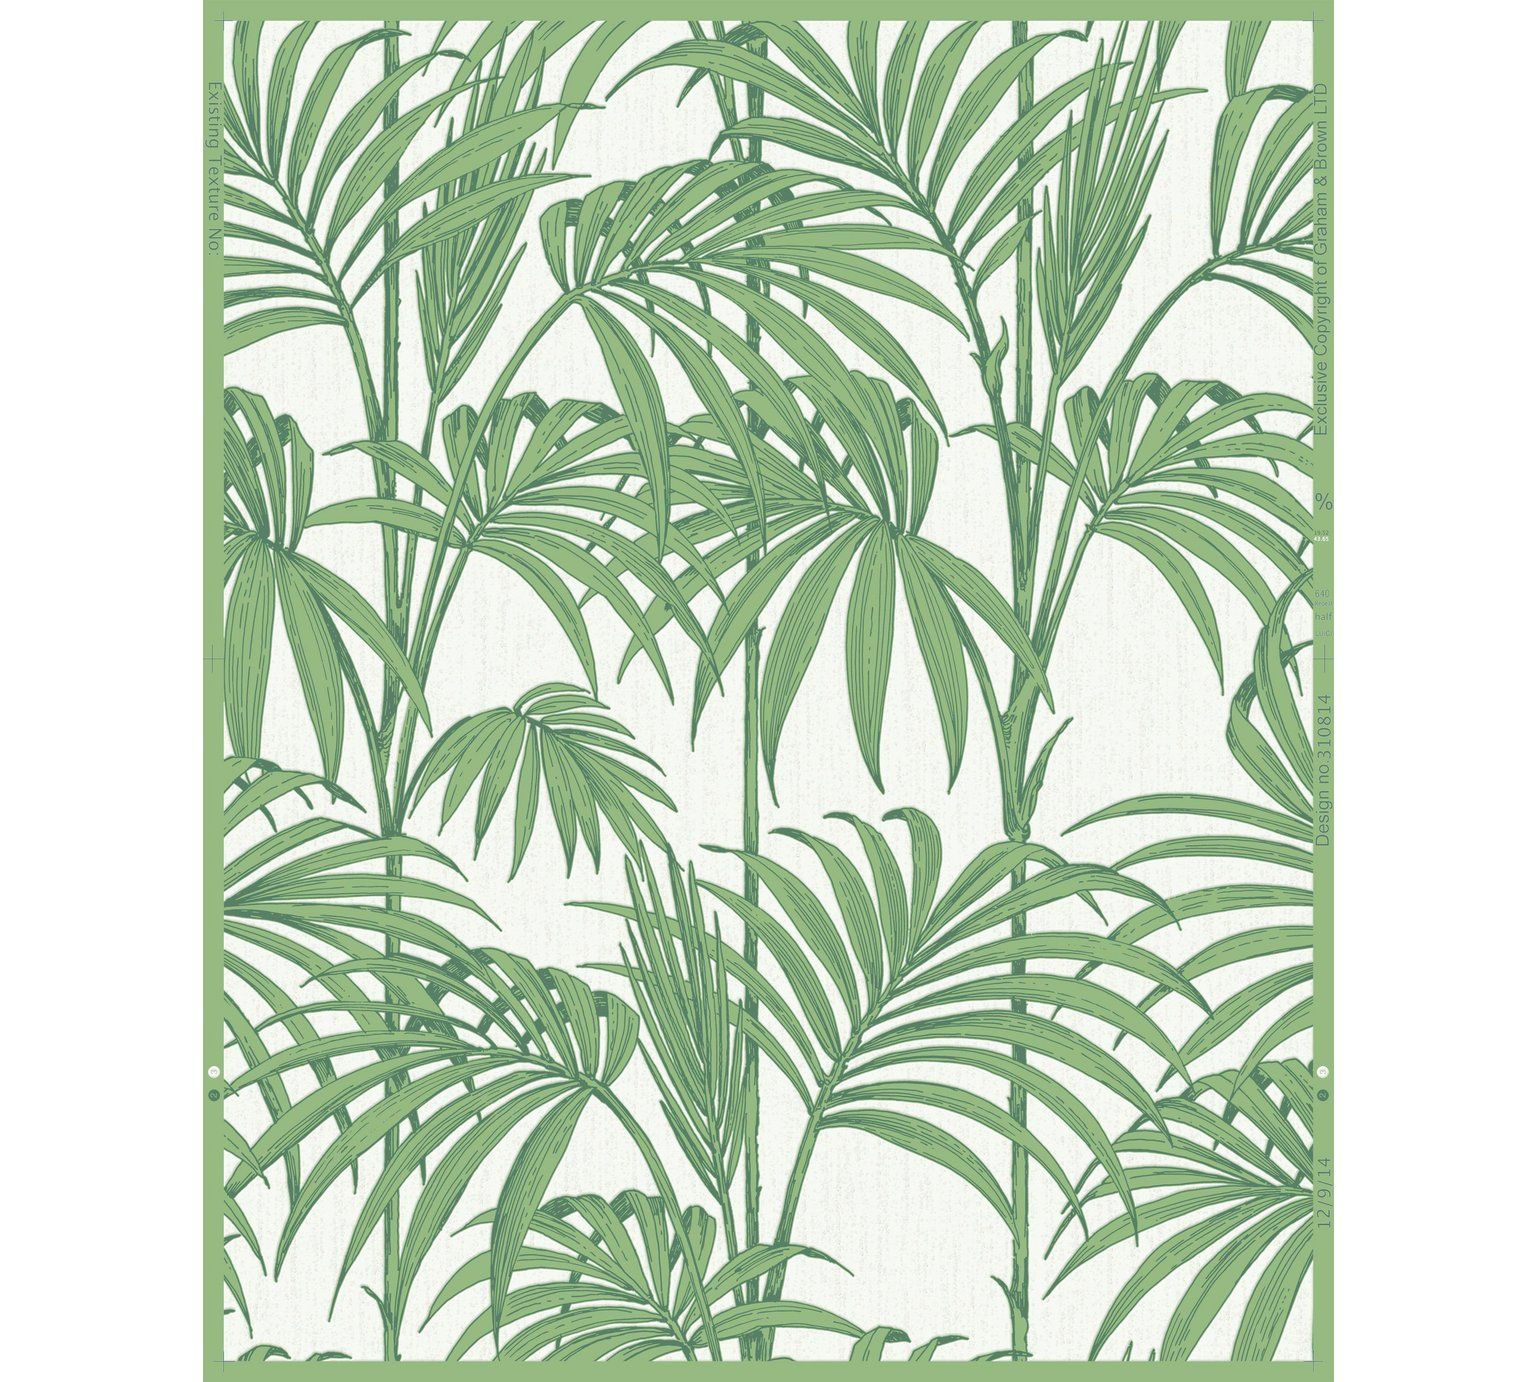 Palm leaf wallpaper image by Sharon Art on wallpaper